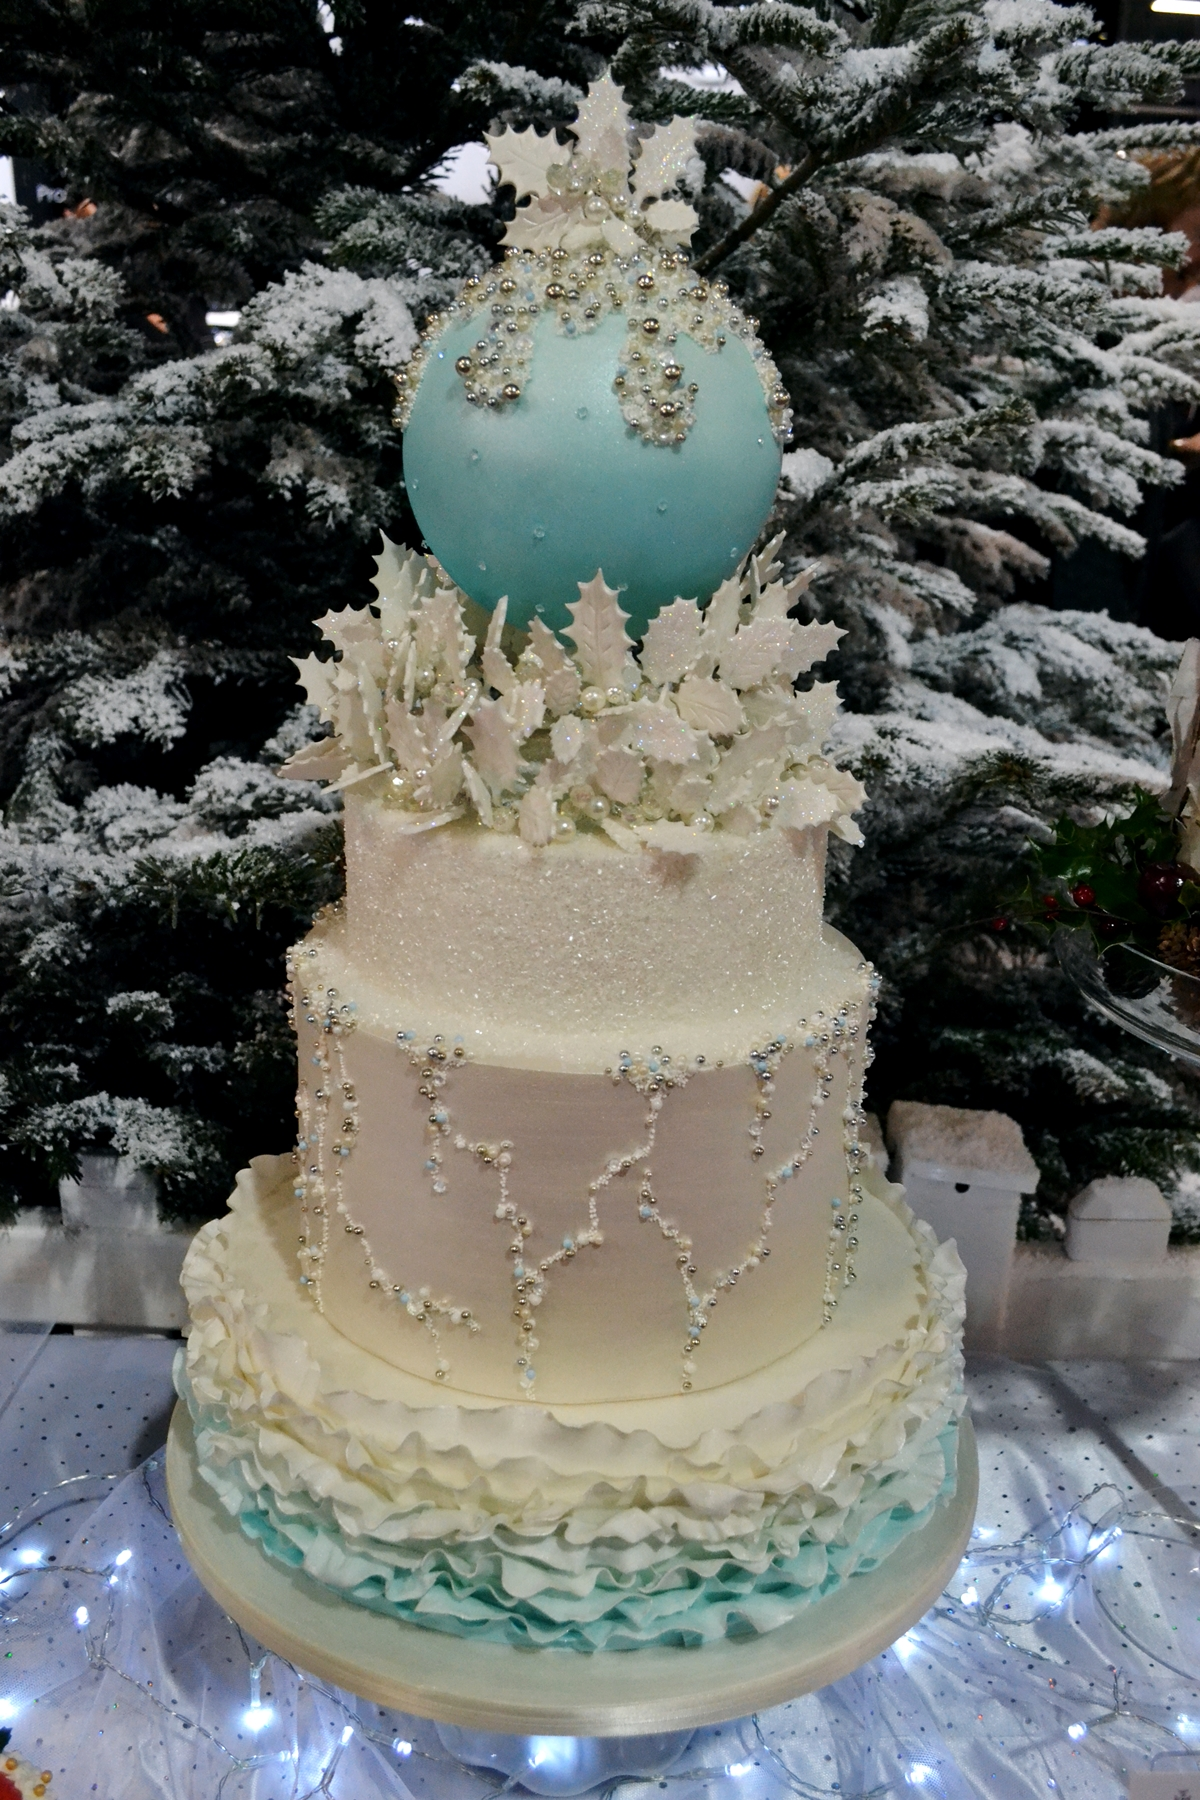 Rebiew Cake And Bake Event City